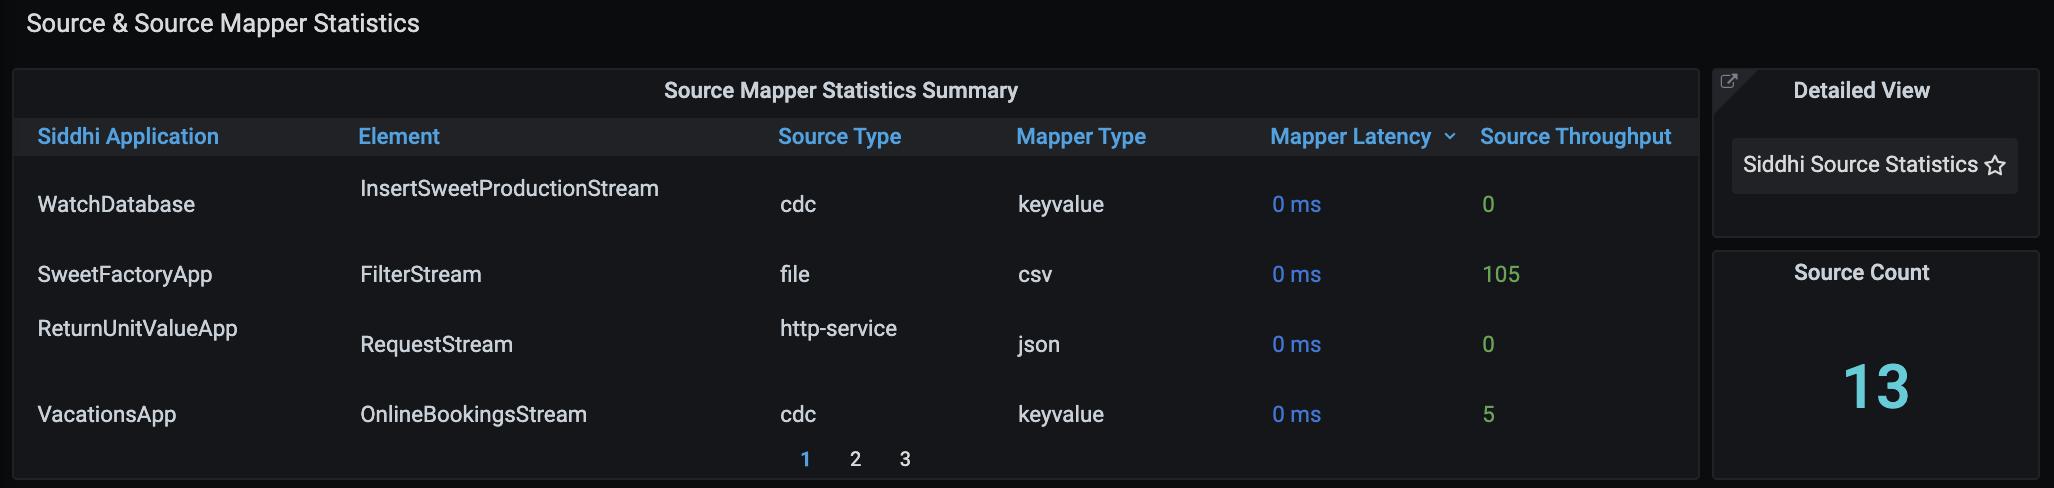 Source and Source Mapper Statistics